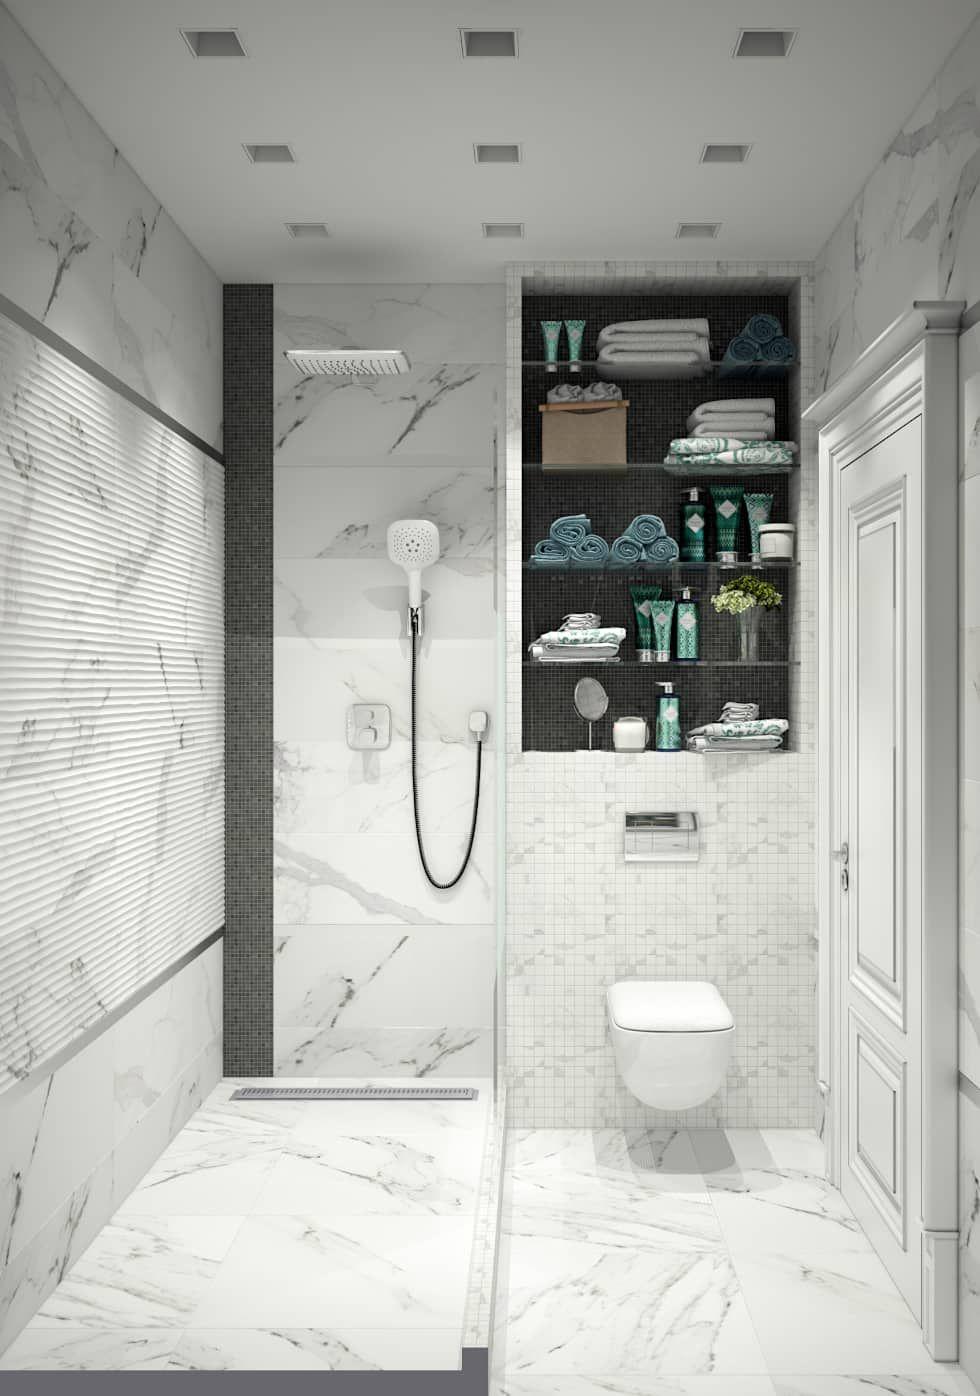 Interior design ideas redecorating u remodeling photos bath